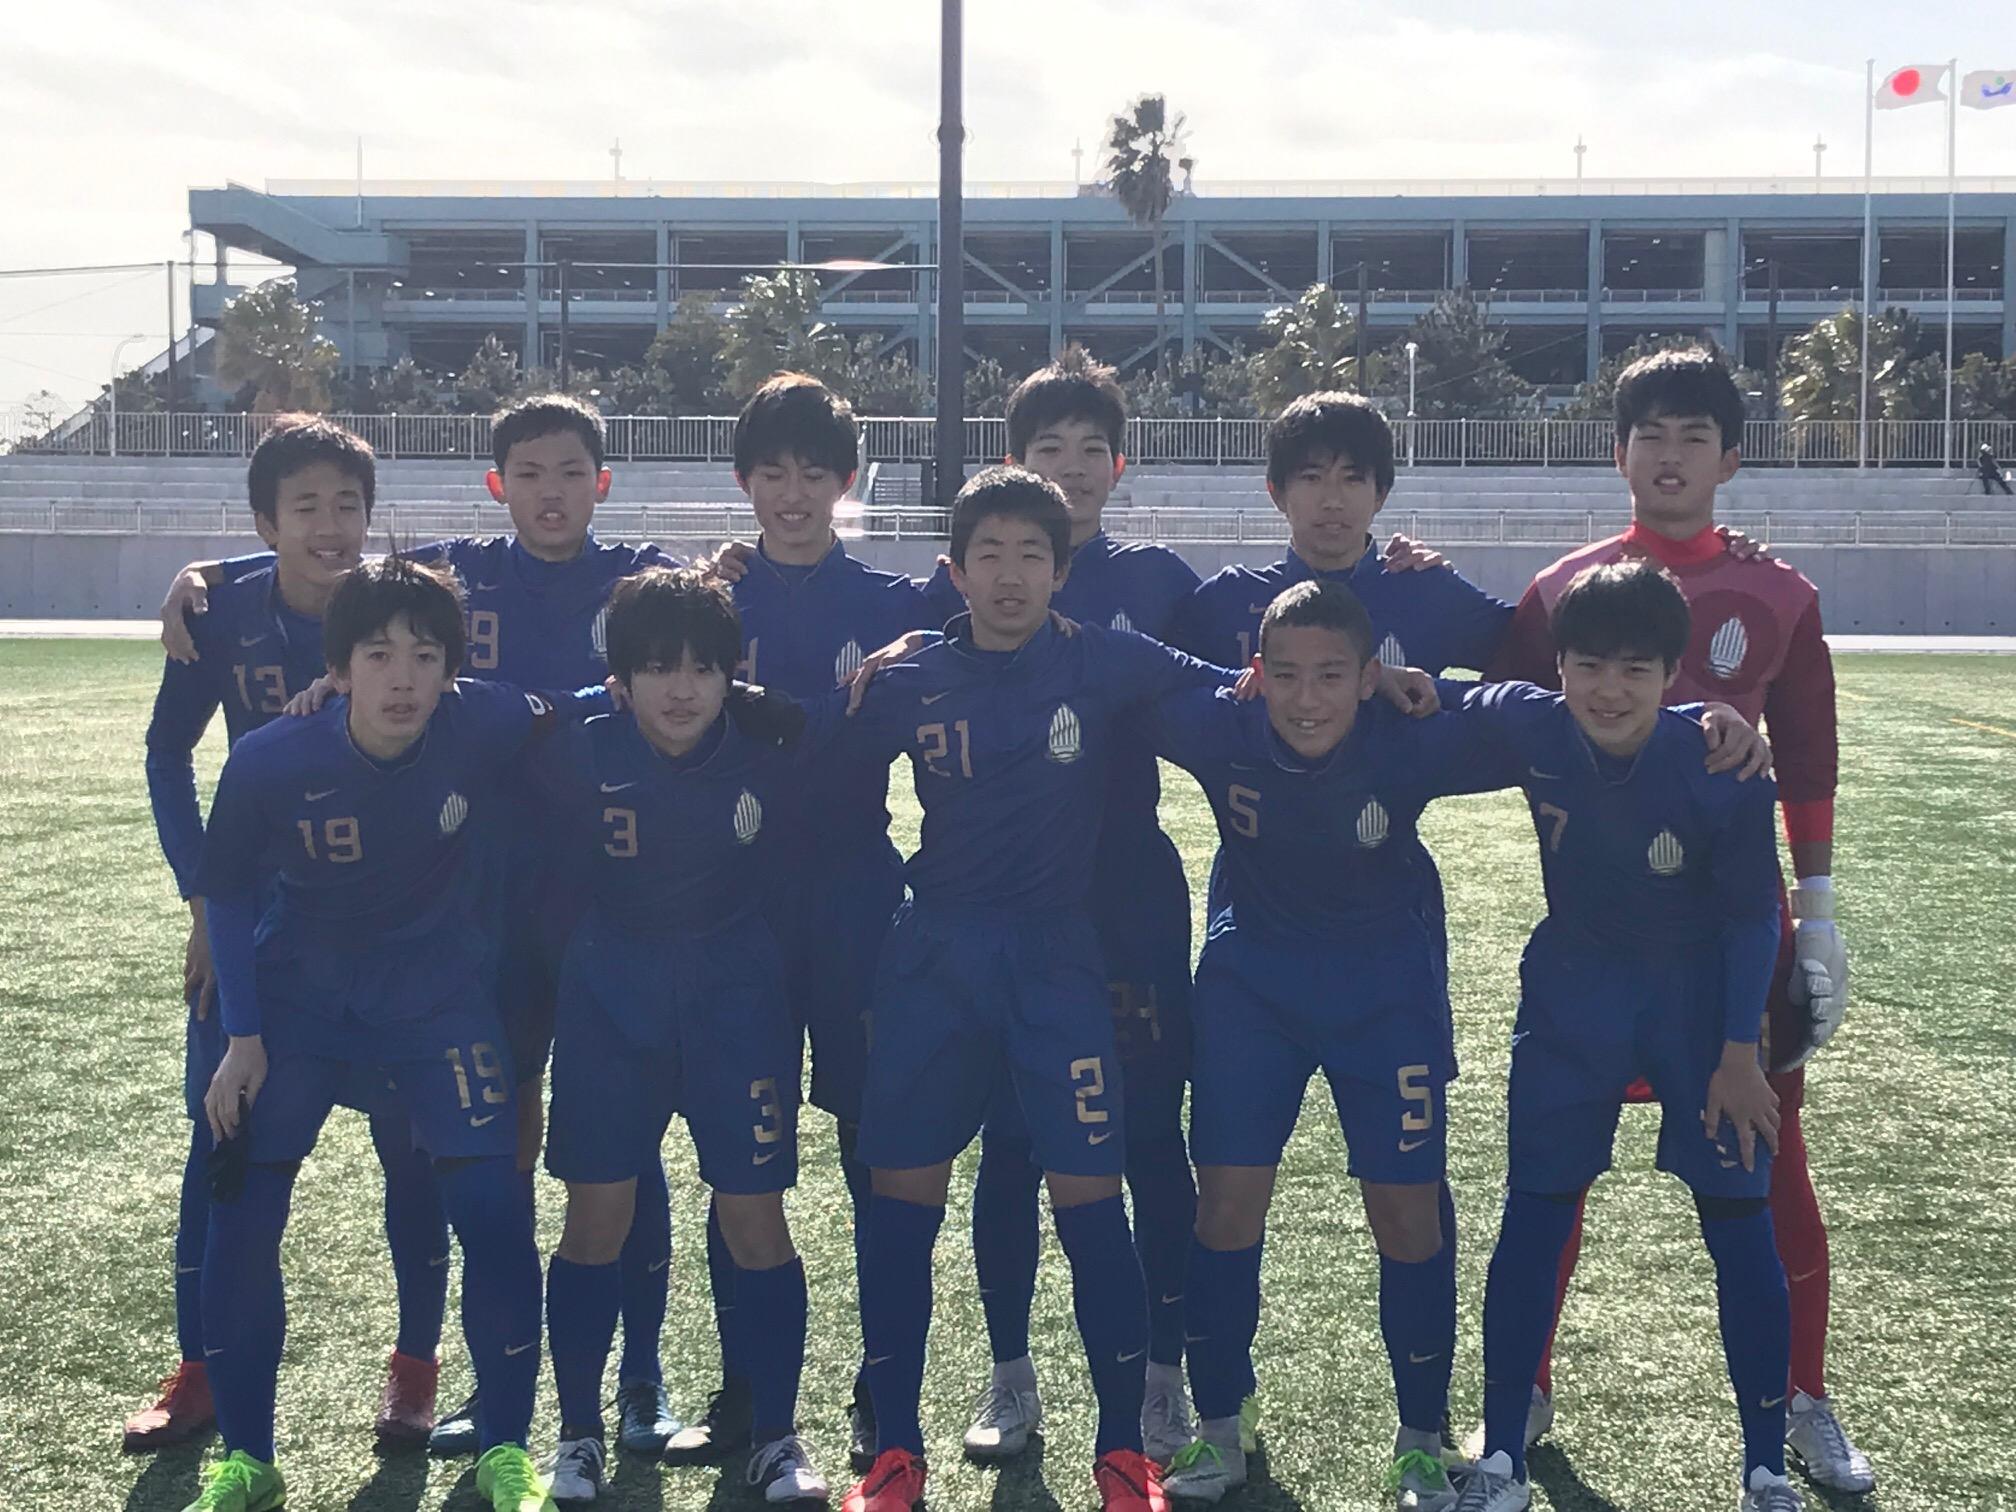 【U15】高円宮杯 U-15サッカー千葉県1部リーグ 第4節